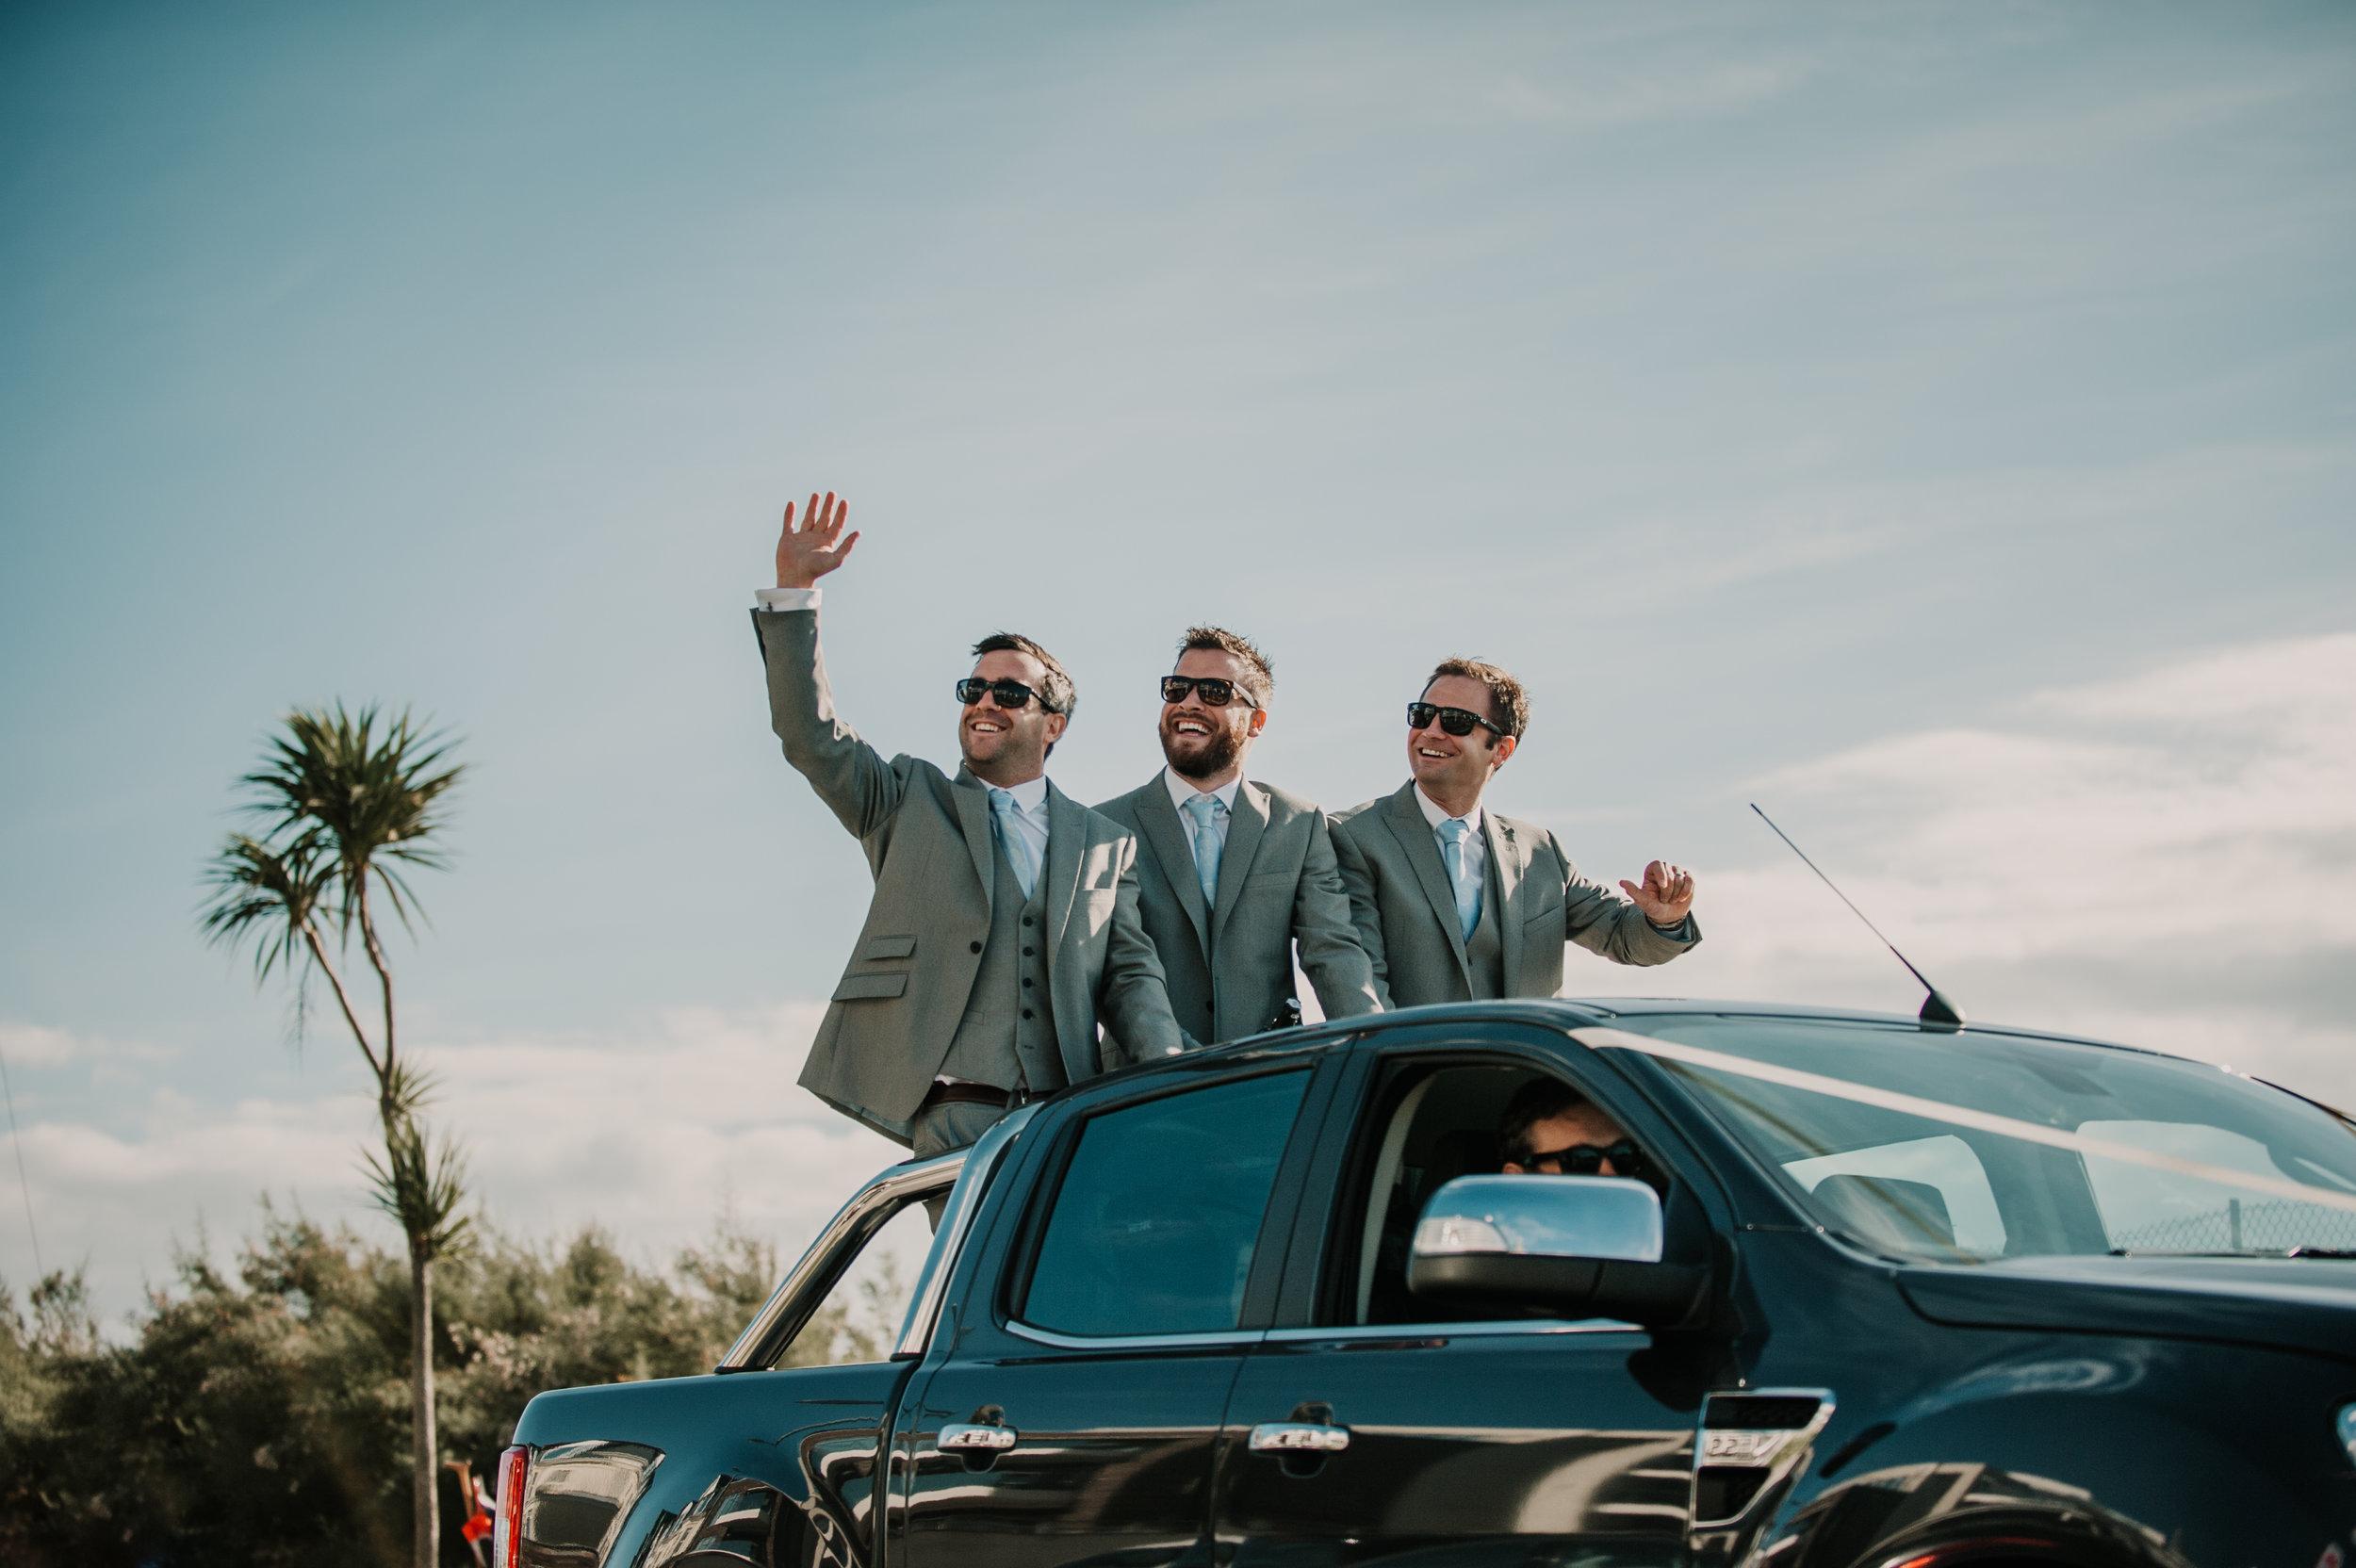 wedding-photographer-cornwall--3.jpg